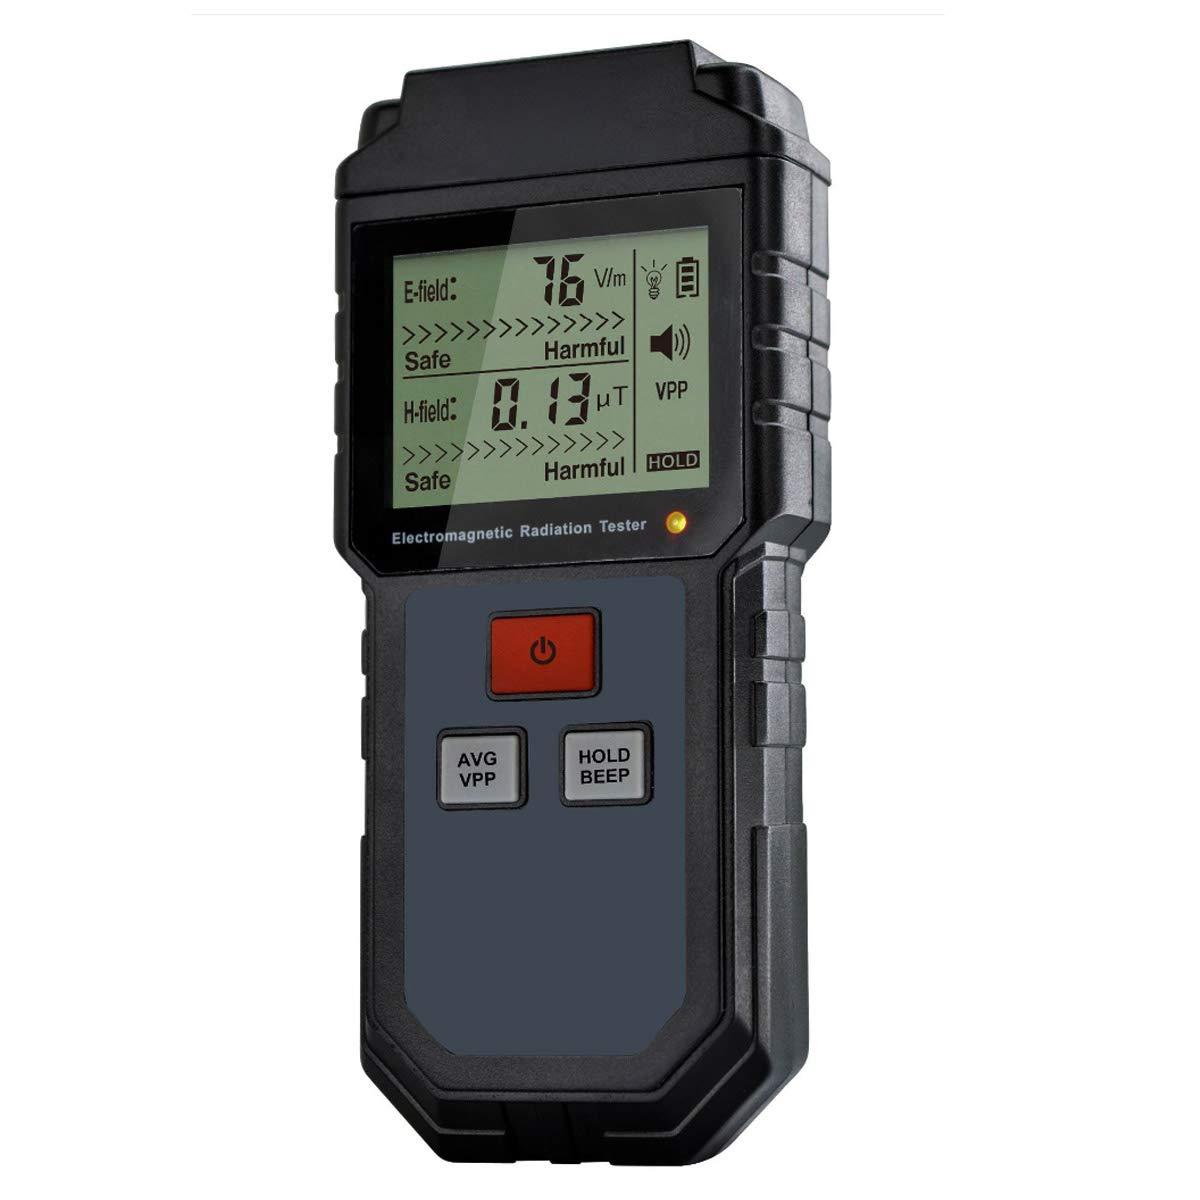 EMF Meter, Household Electromagnetic Radiation Tester, Electric Field and Magnetic Field Radiation Handheld Mini Digital LCD Temperature EMF Detector Dosimeter Tester